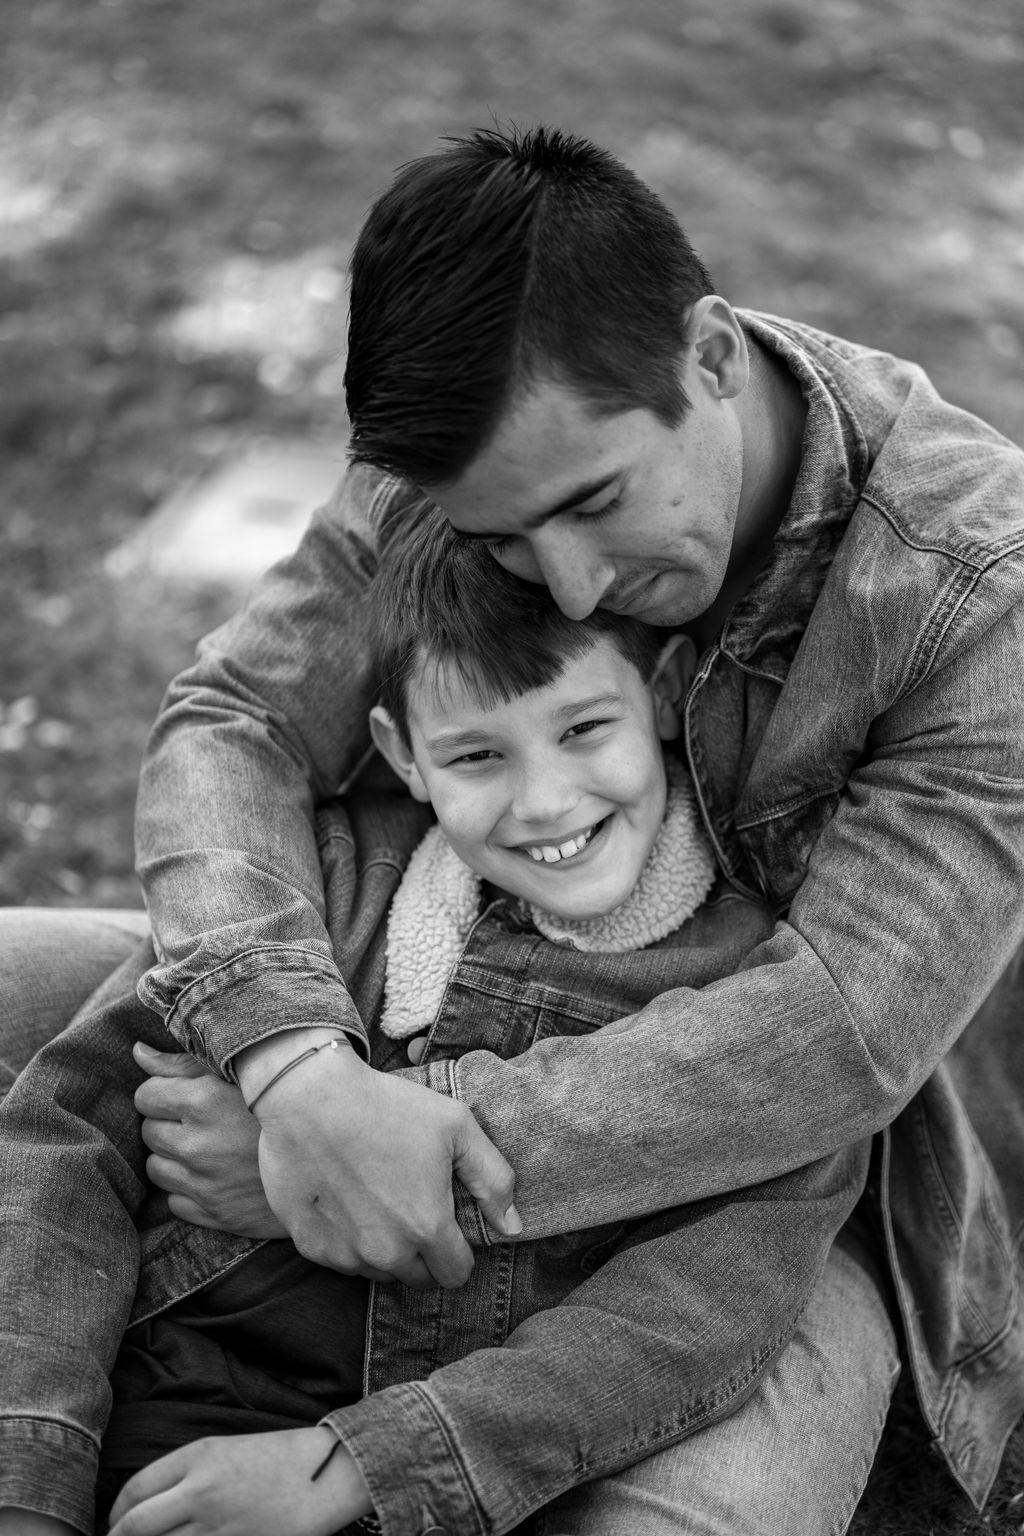 Family Photography - South Boston 2021